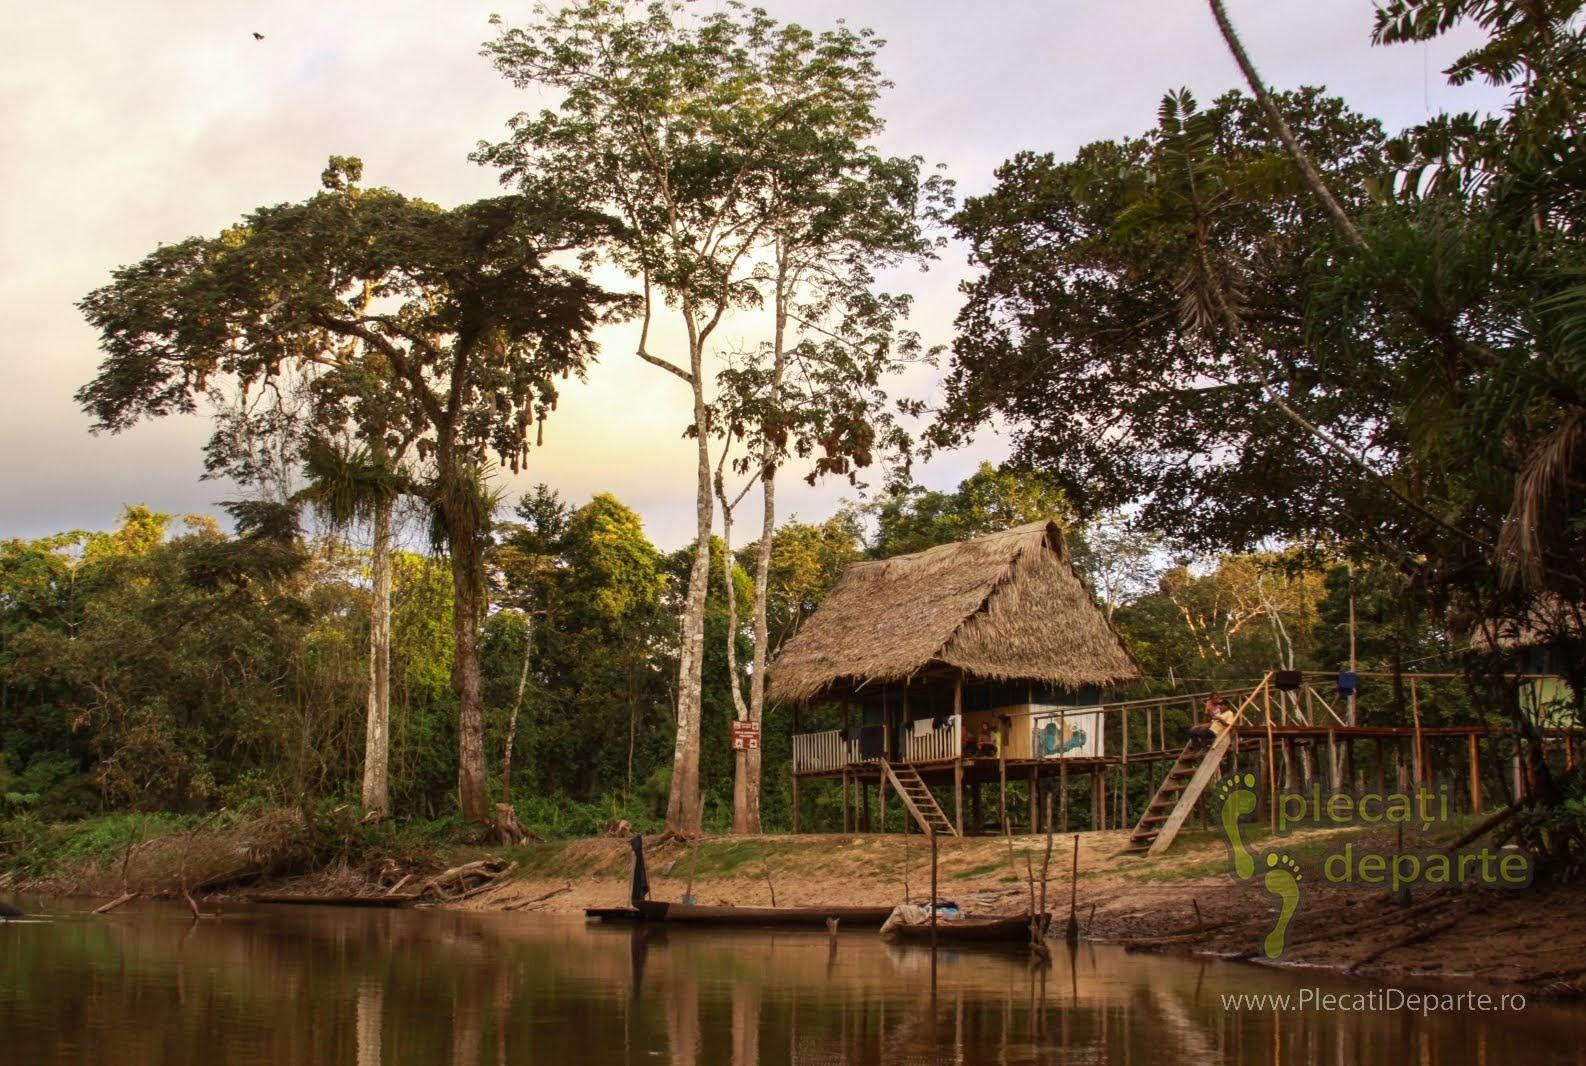 Refugiul sau popasul Posa Gloria, in jungla amazoniana, in Rezervatia Nationala Pacaya-Samiria, Peru